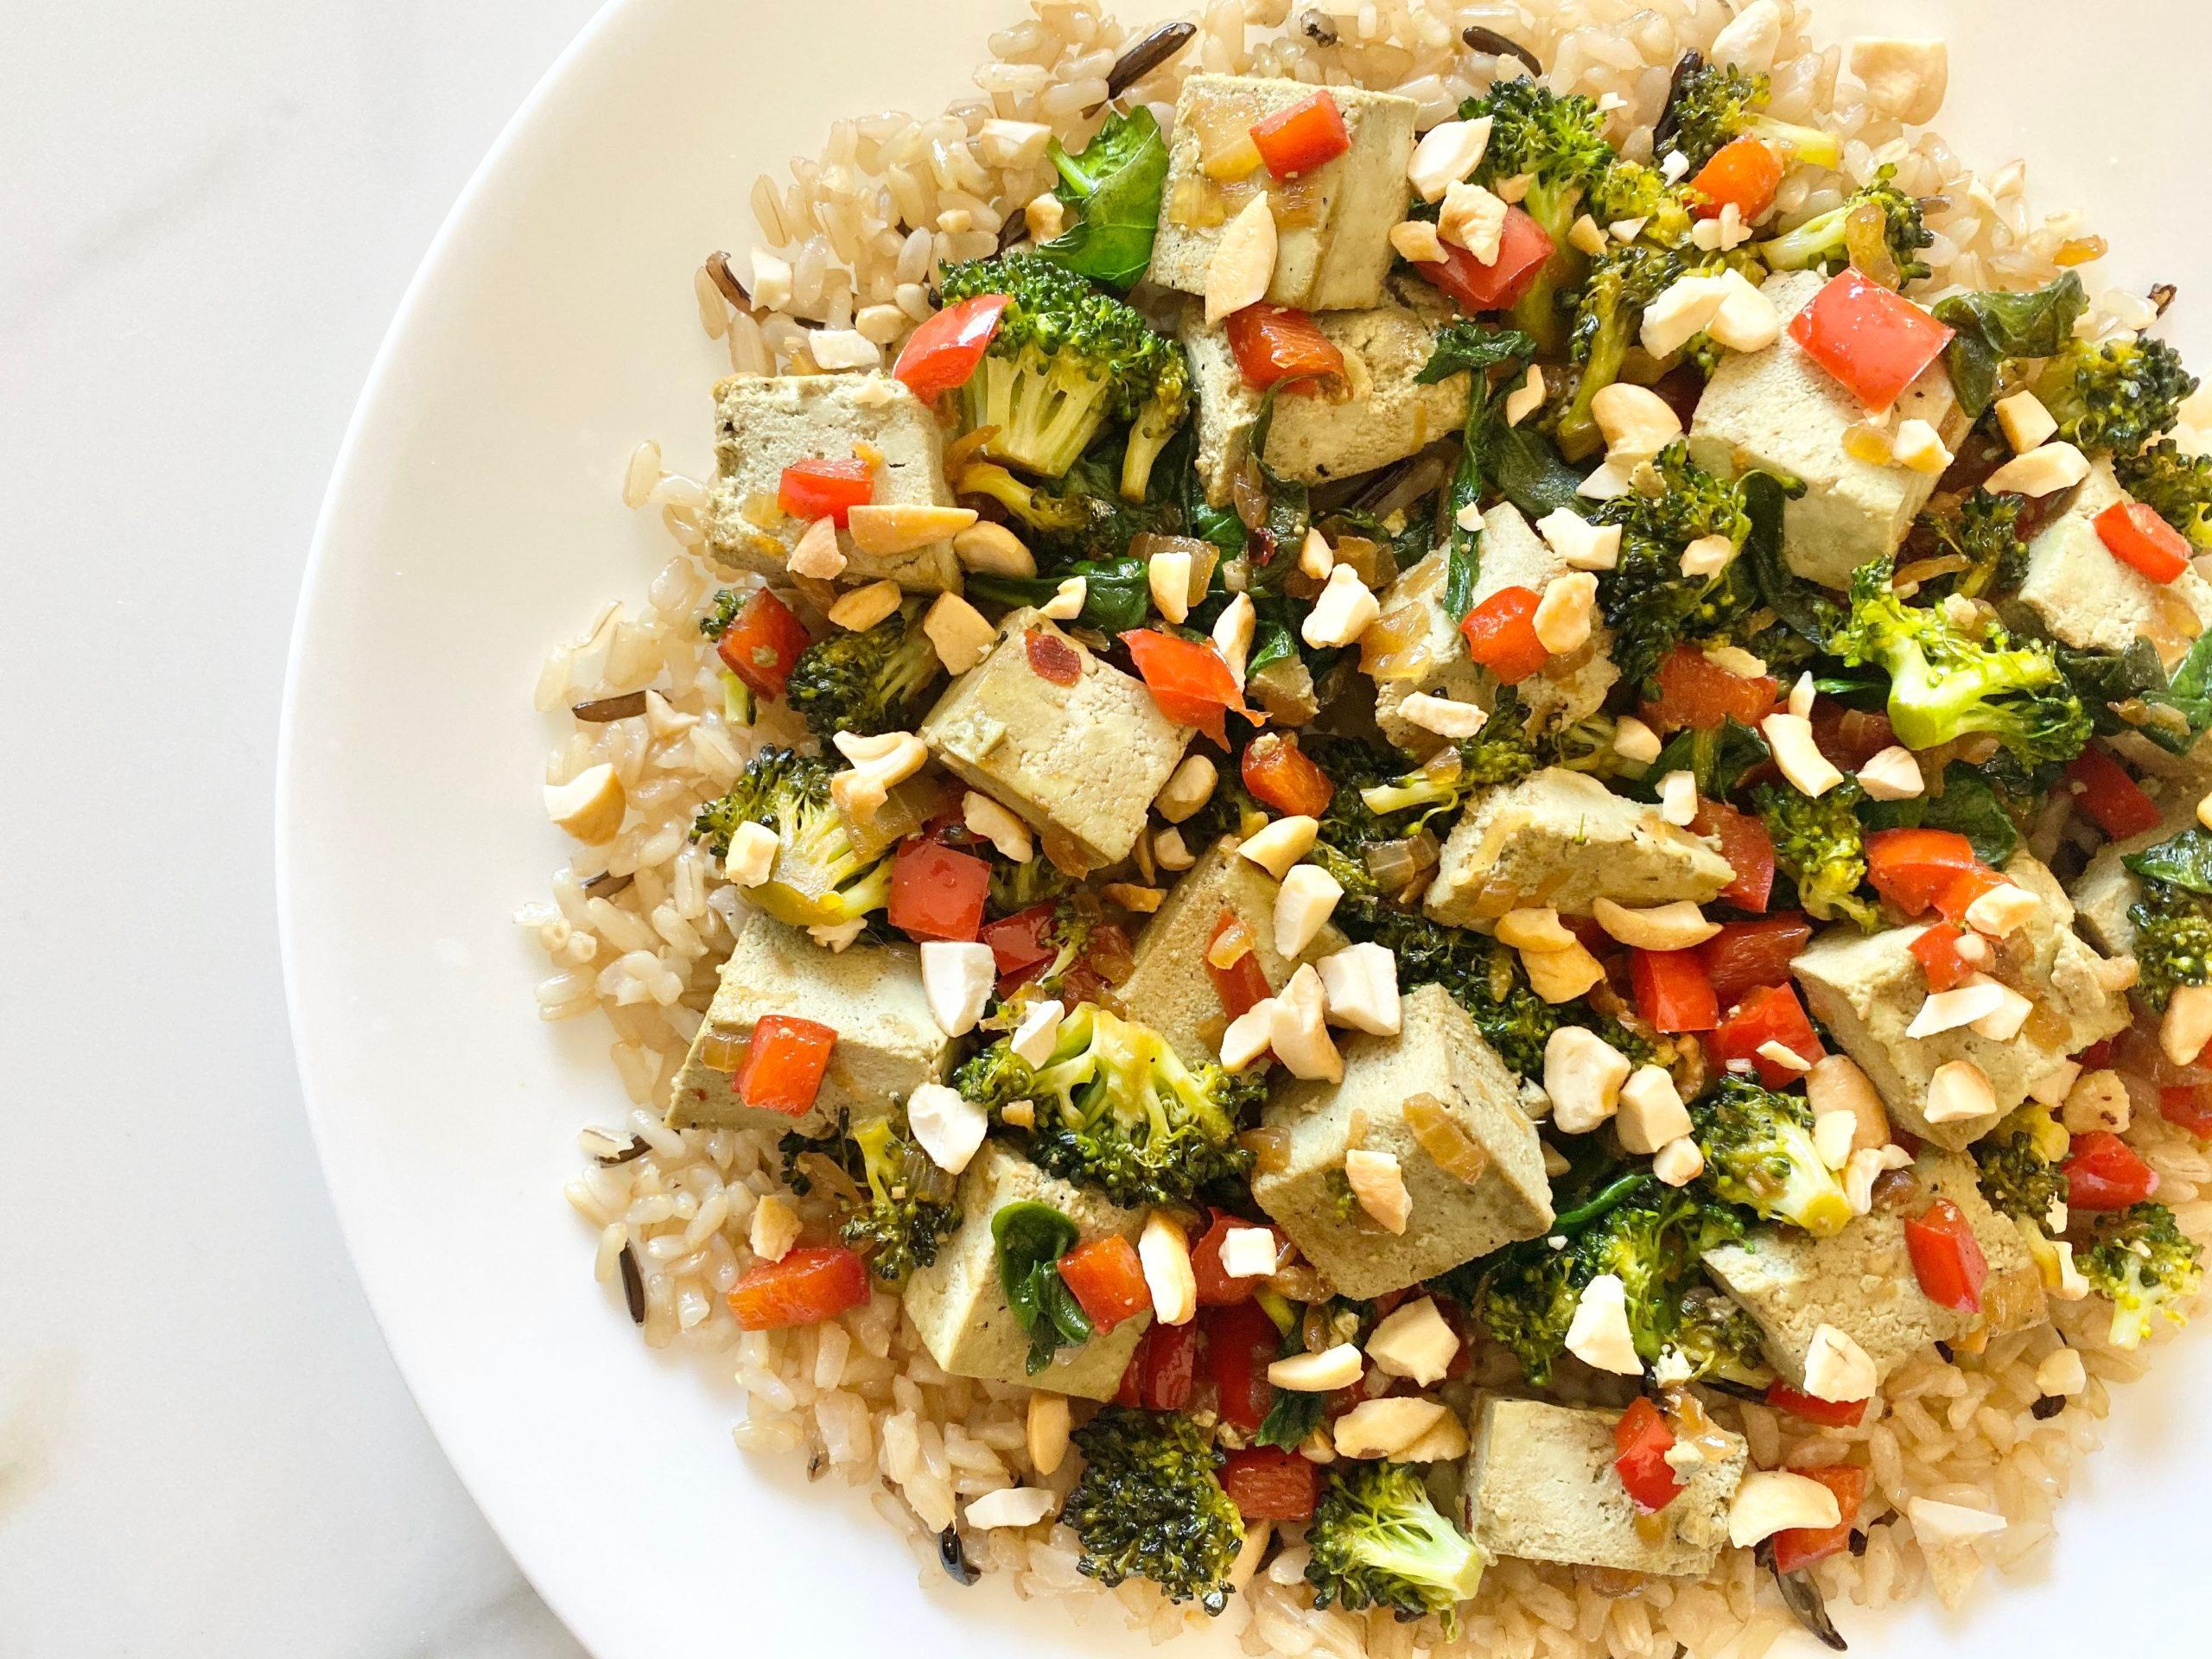 High Protein Vegan Stir Fry Recipe